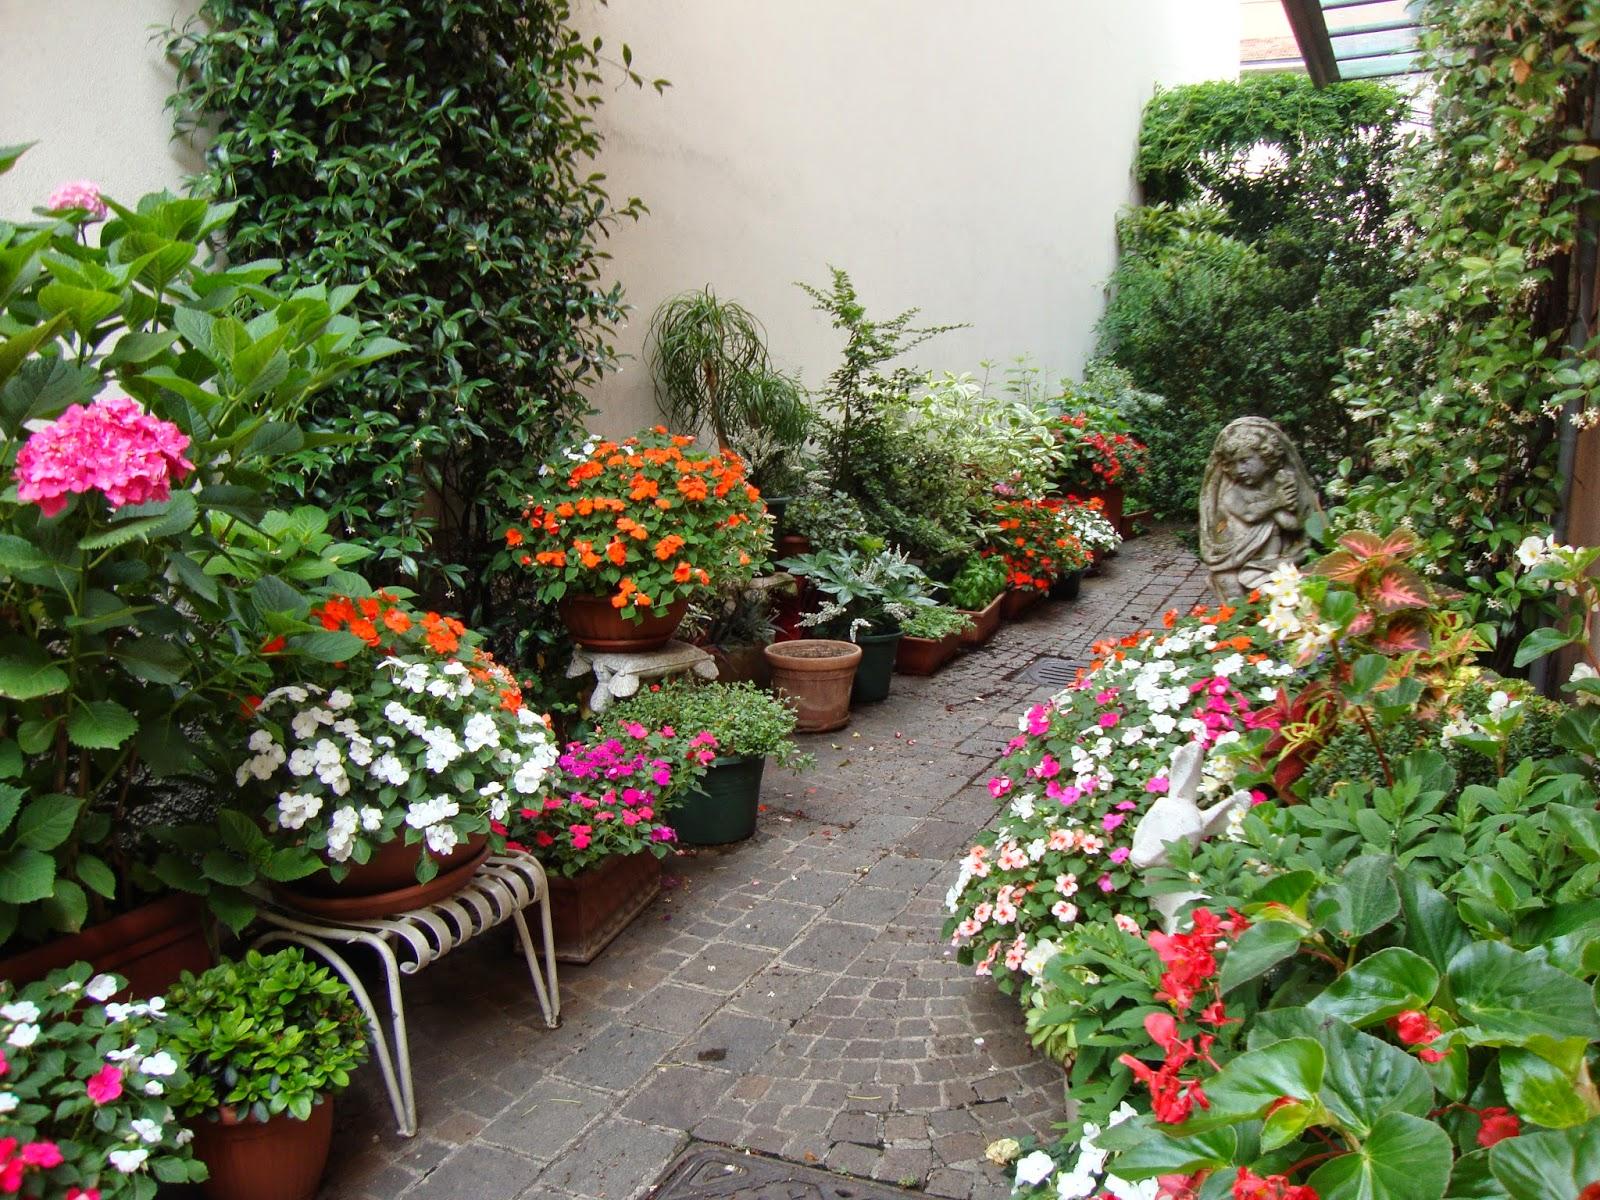 Un piccolo giardino in citt un piccolo giardino in vasiun for Giardino piccolo